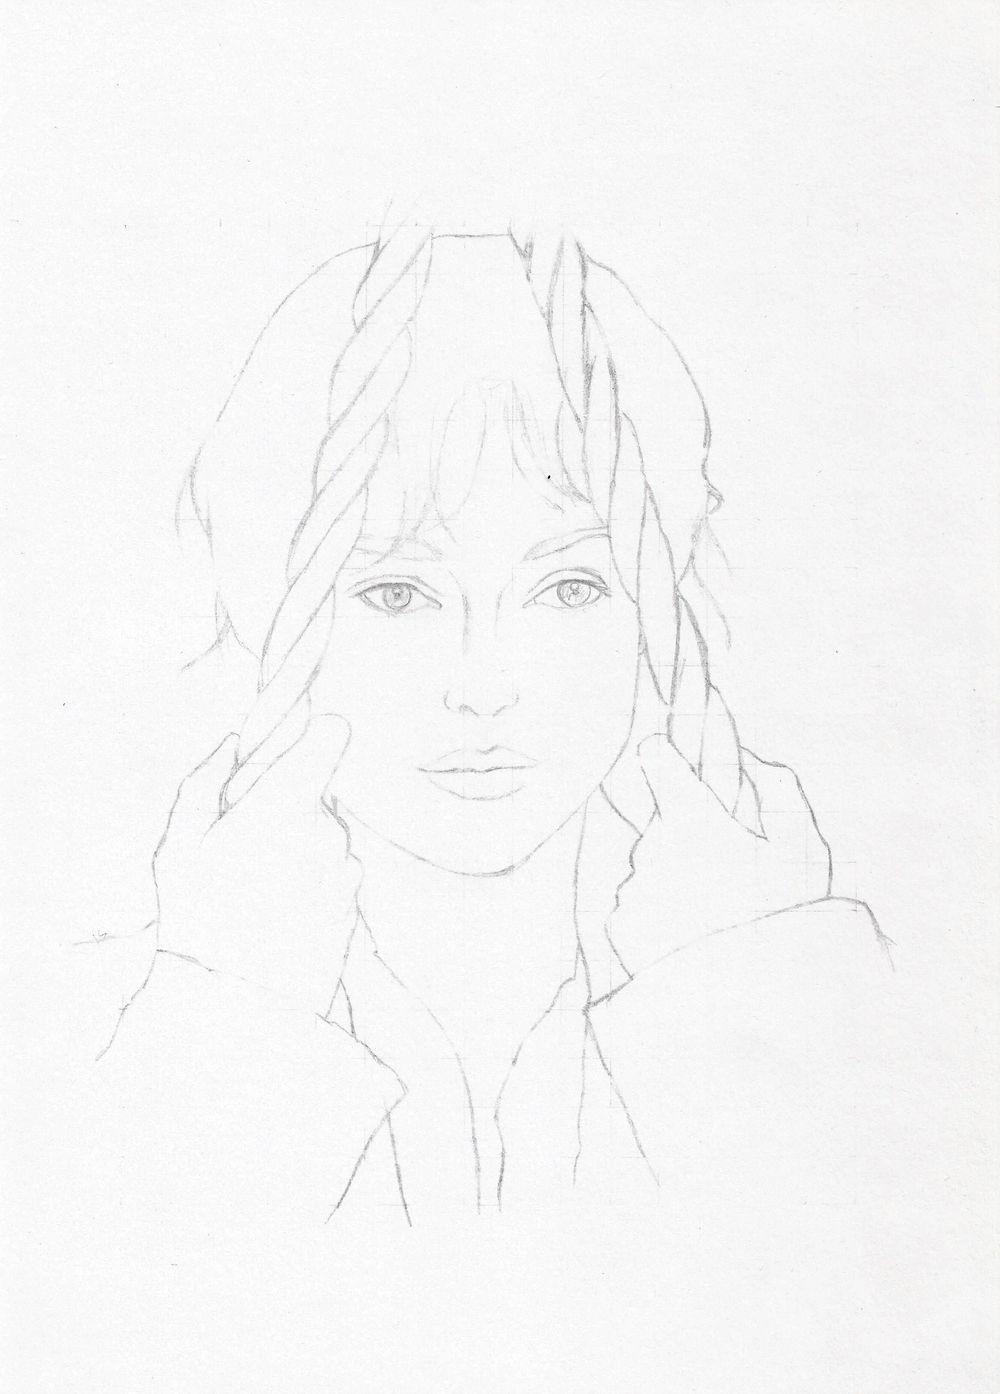 Portrait: Keira Knightley as Elizabeth Bennet - image 1 - student project